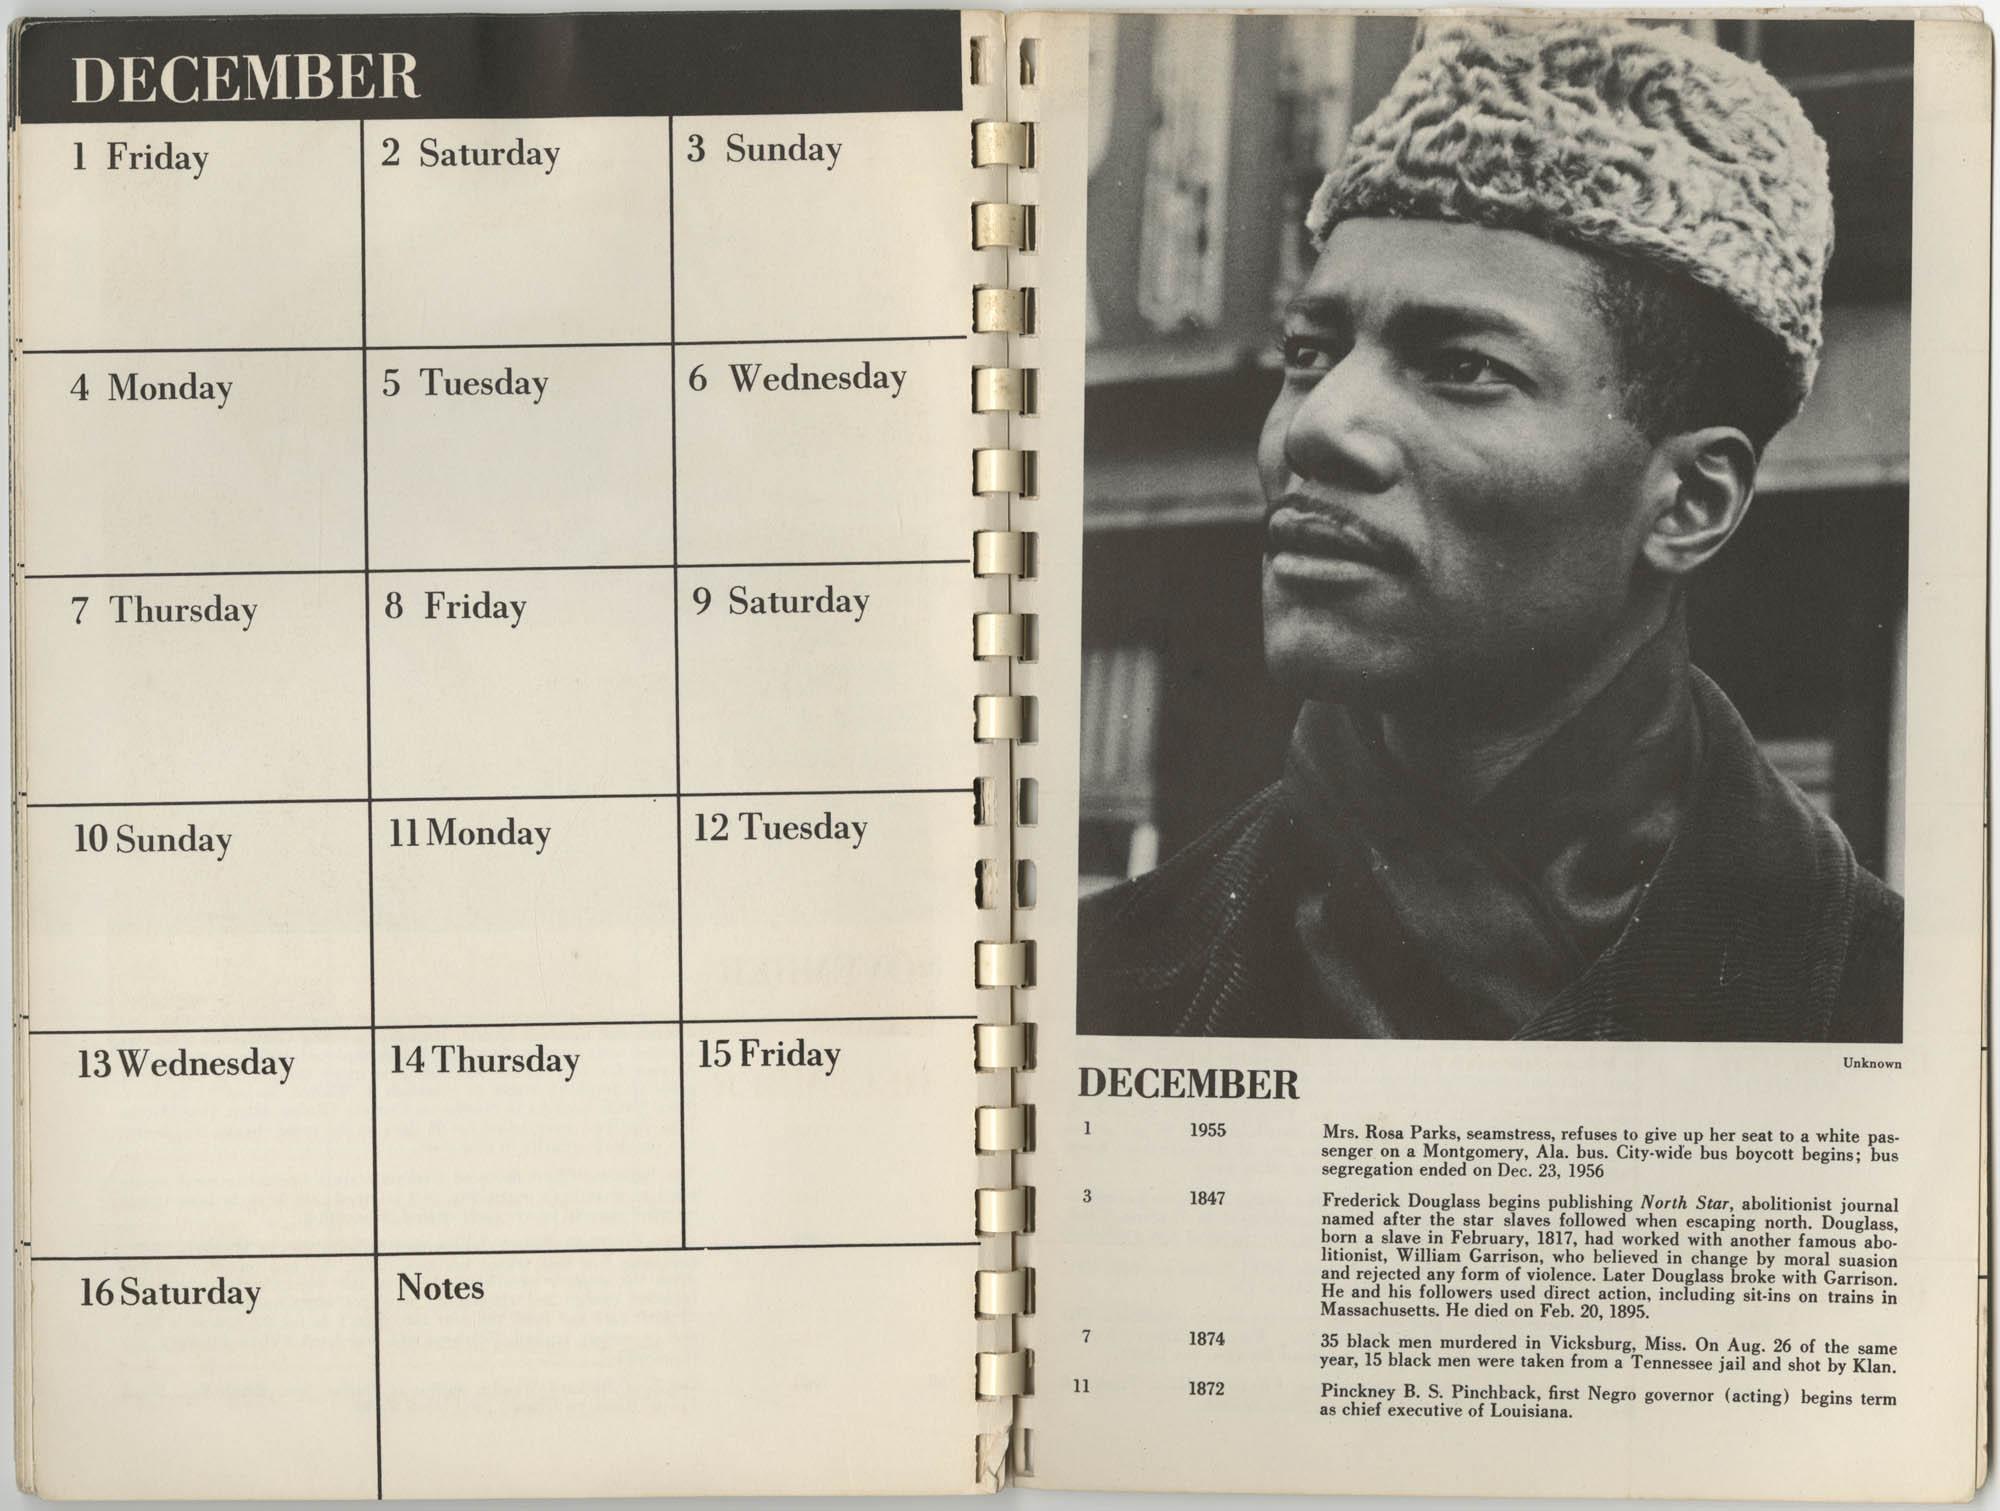 1967 SNCC Calendar, December 1-16